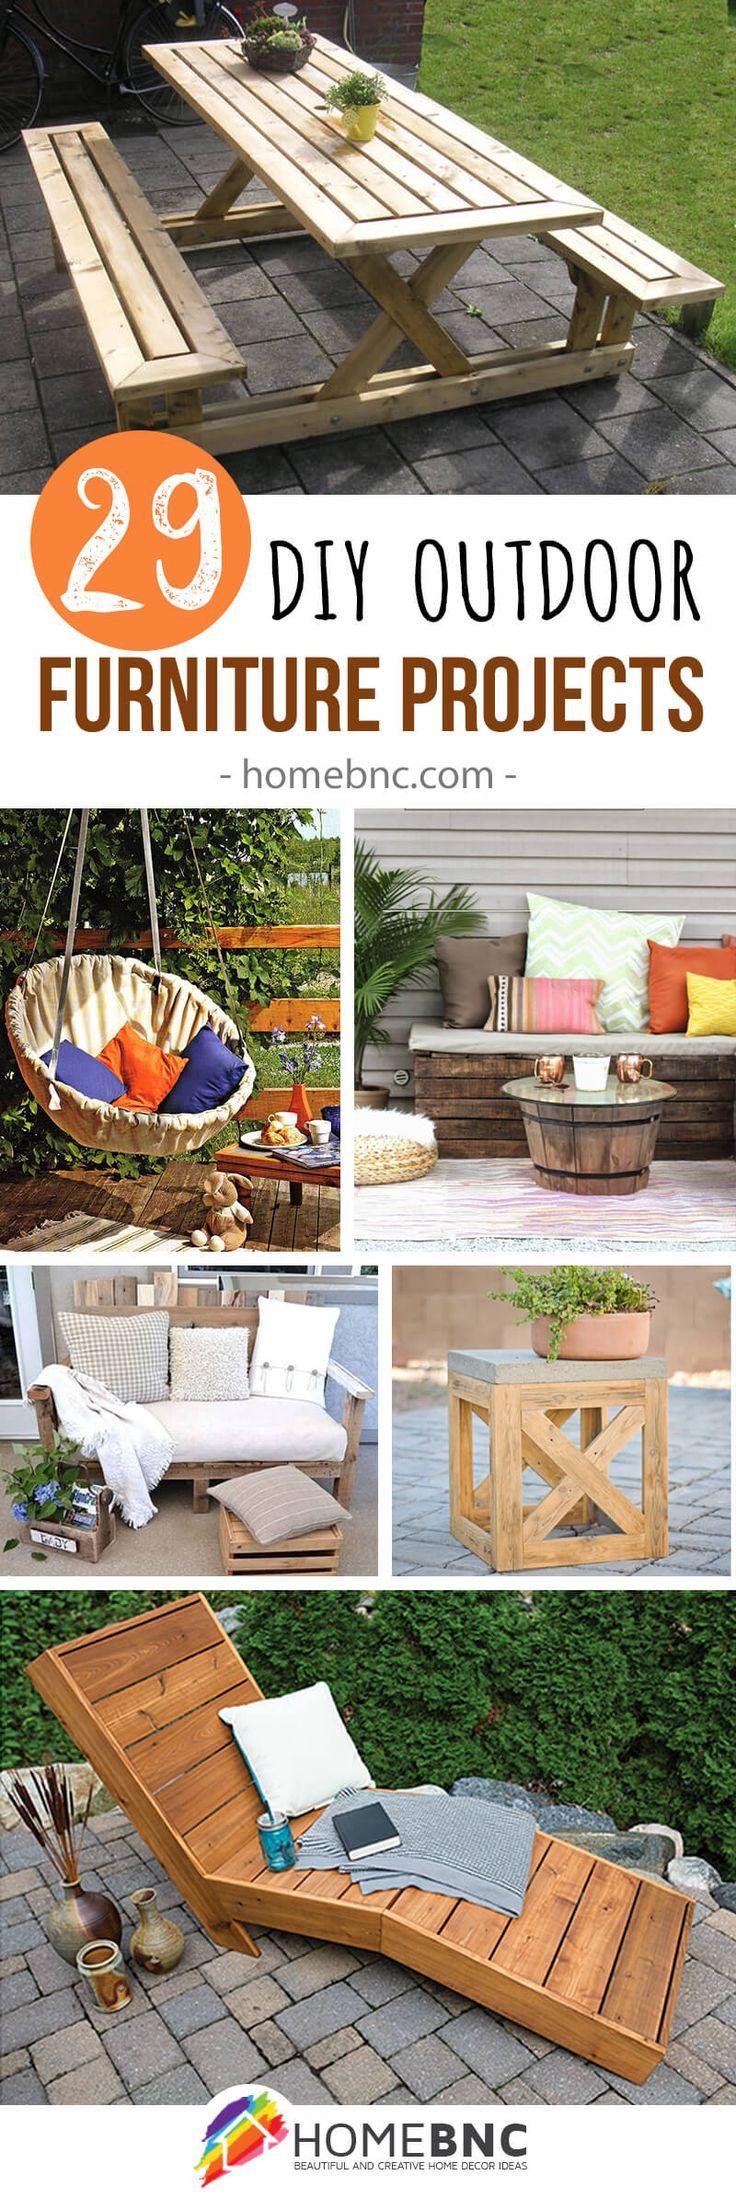 519 Best Diy Porch Projects Images On Pinterest Backyard 400 x 300